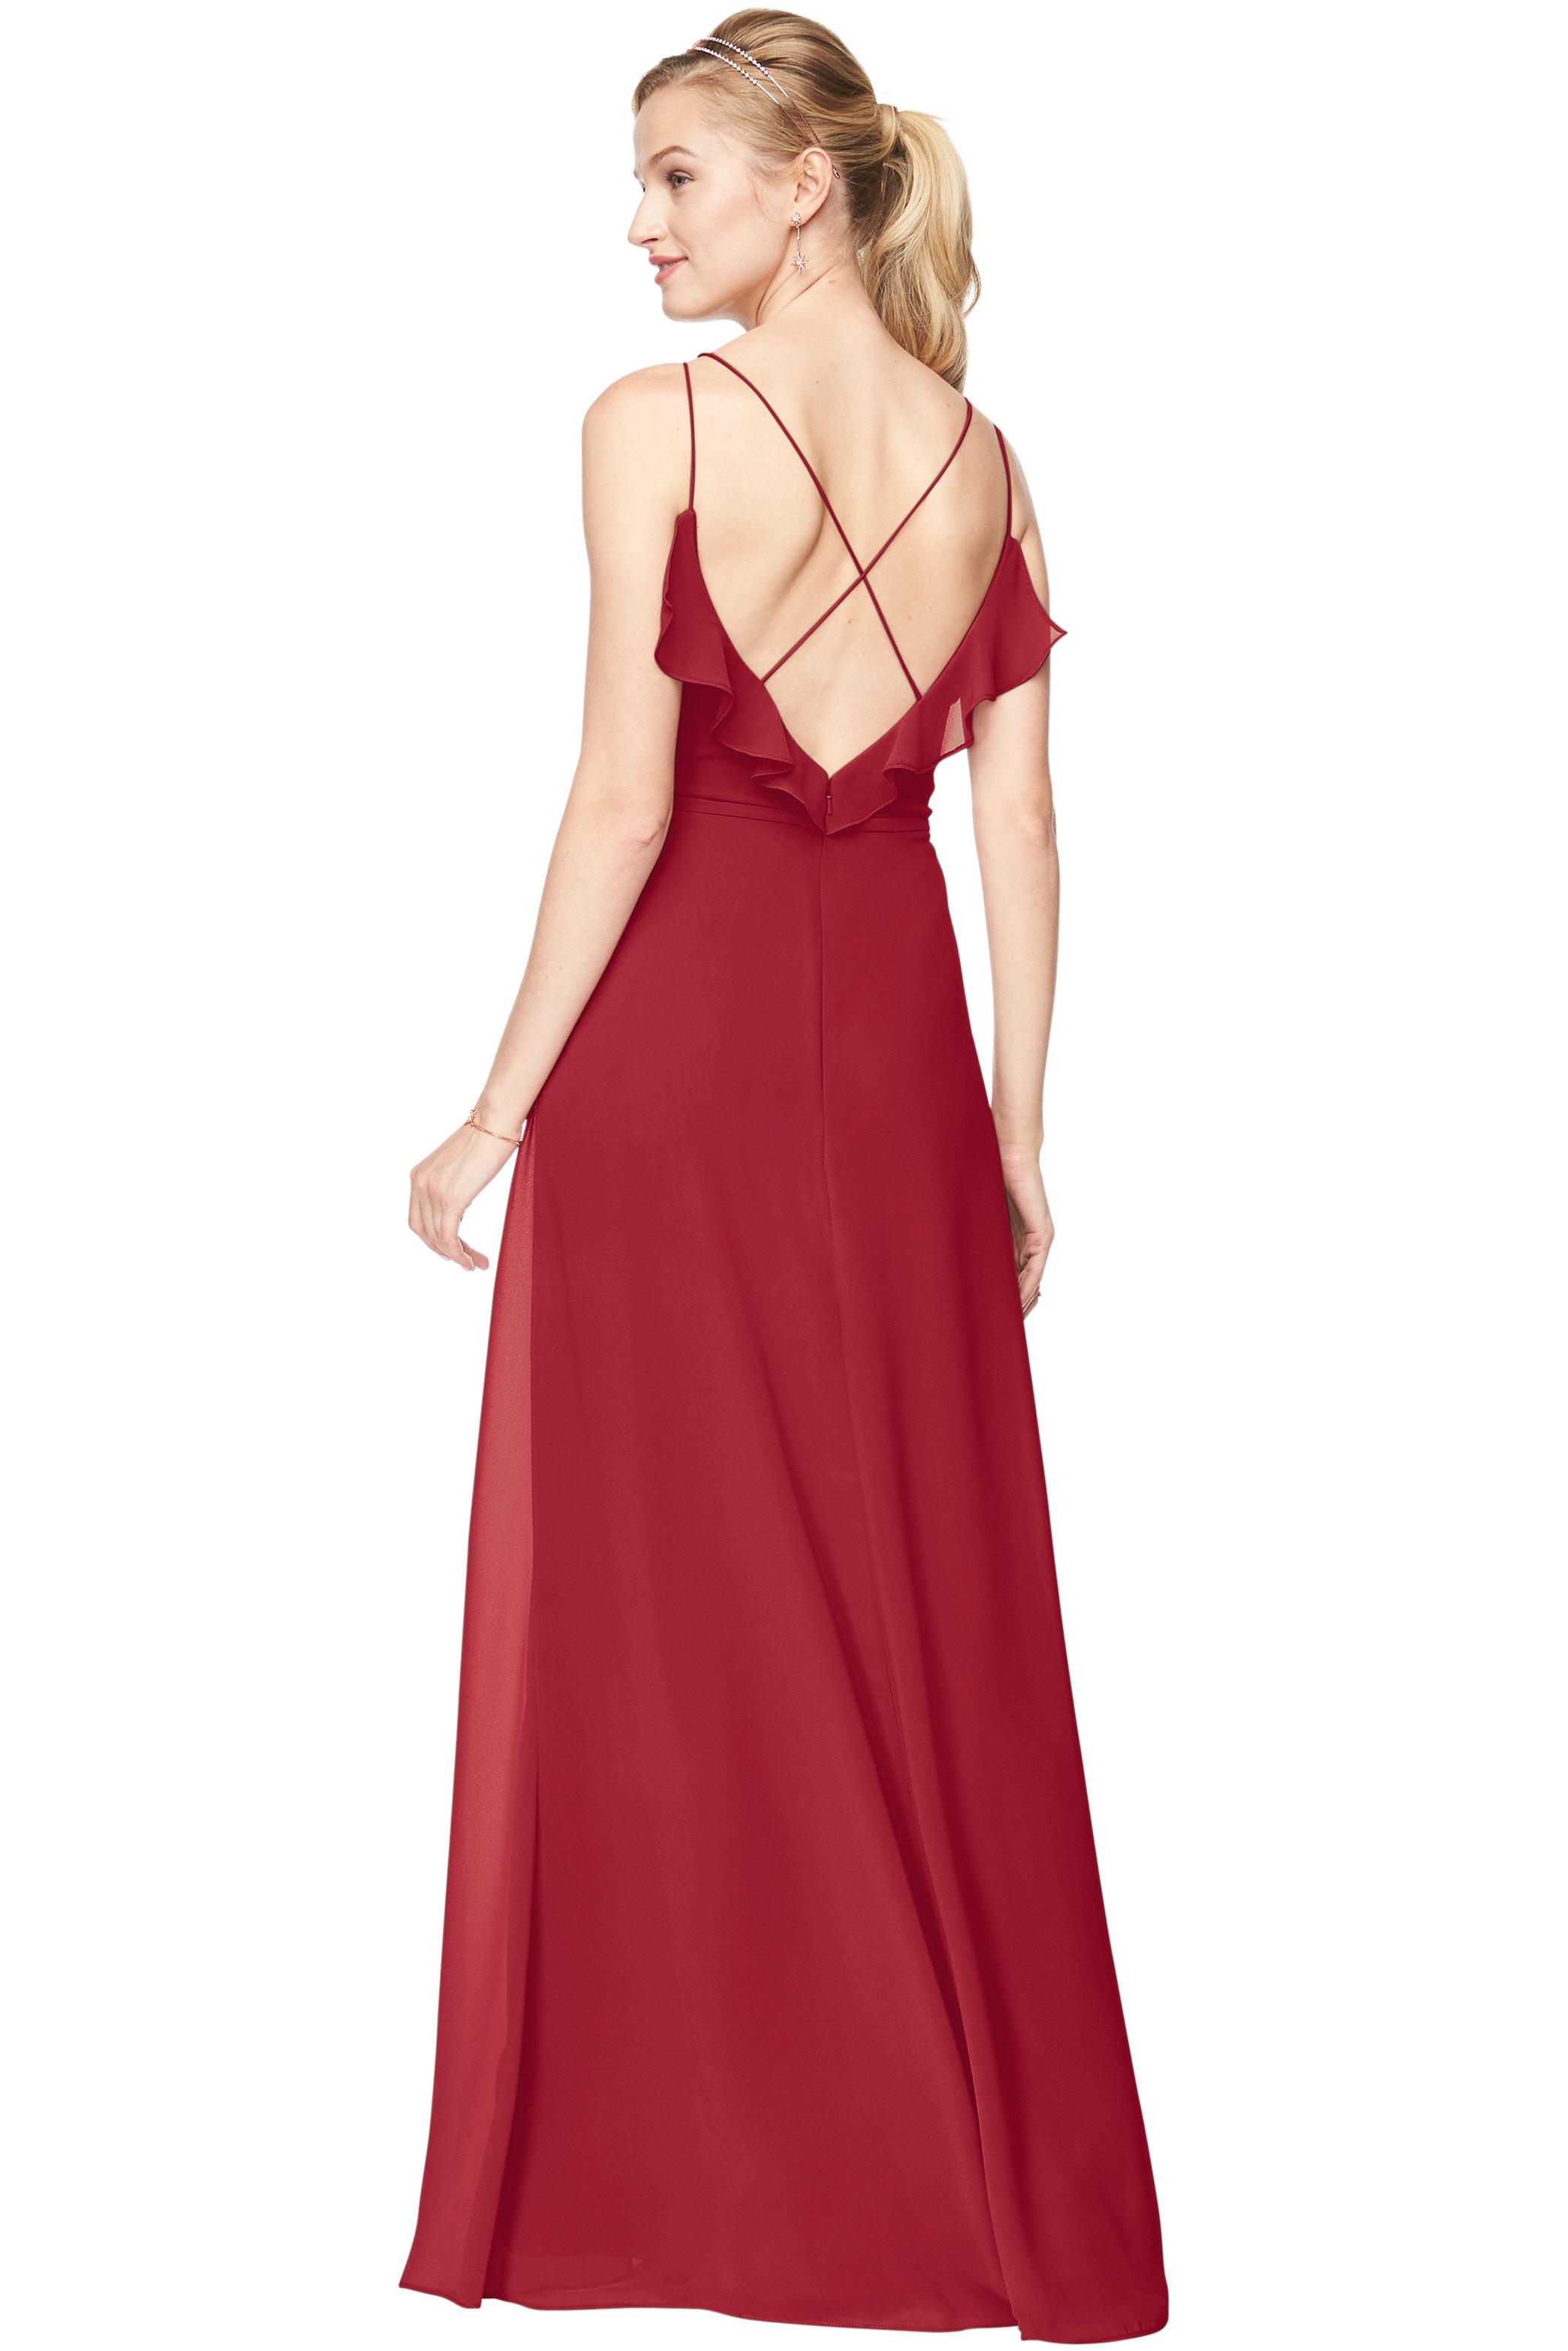 Bill Levkoff CRANBERRY Chiffon V-Neck A-line gown, $198.00 Back